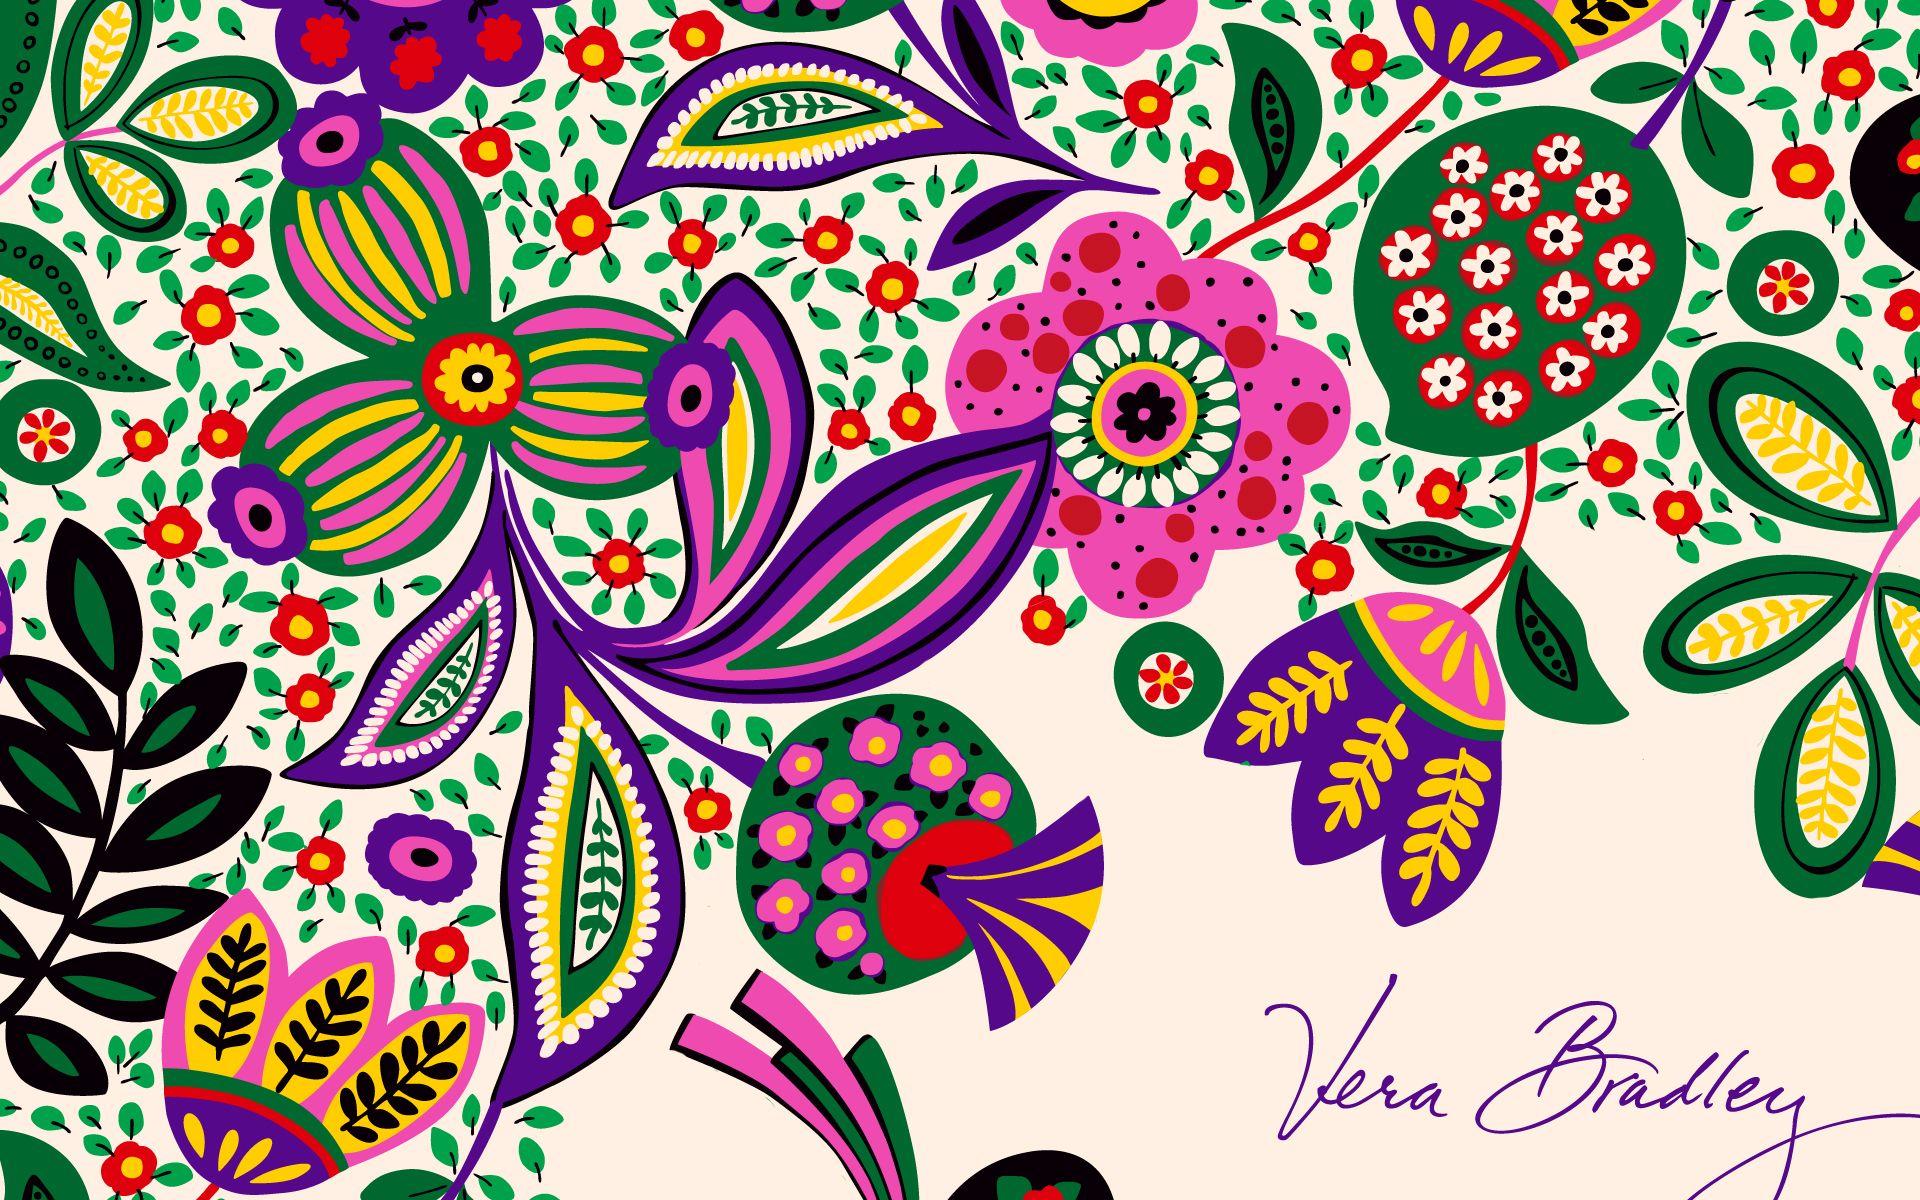 Vera Bradley Vera Bradley Wallpaper Wallpaper Crafts Wallpaper